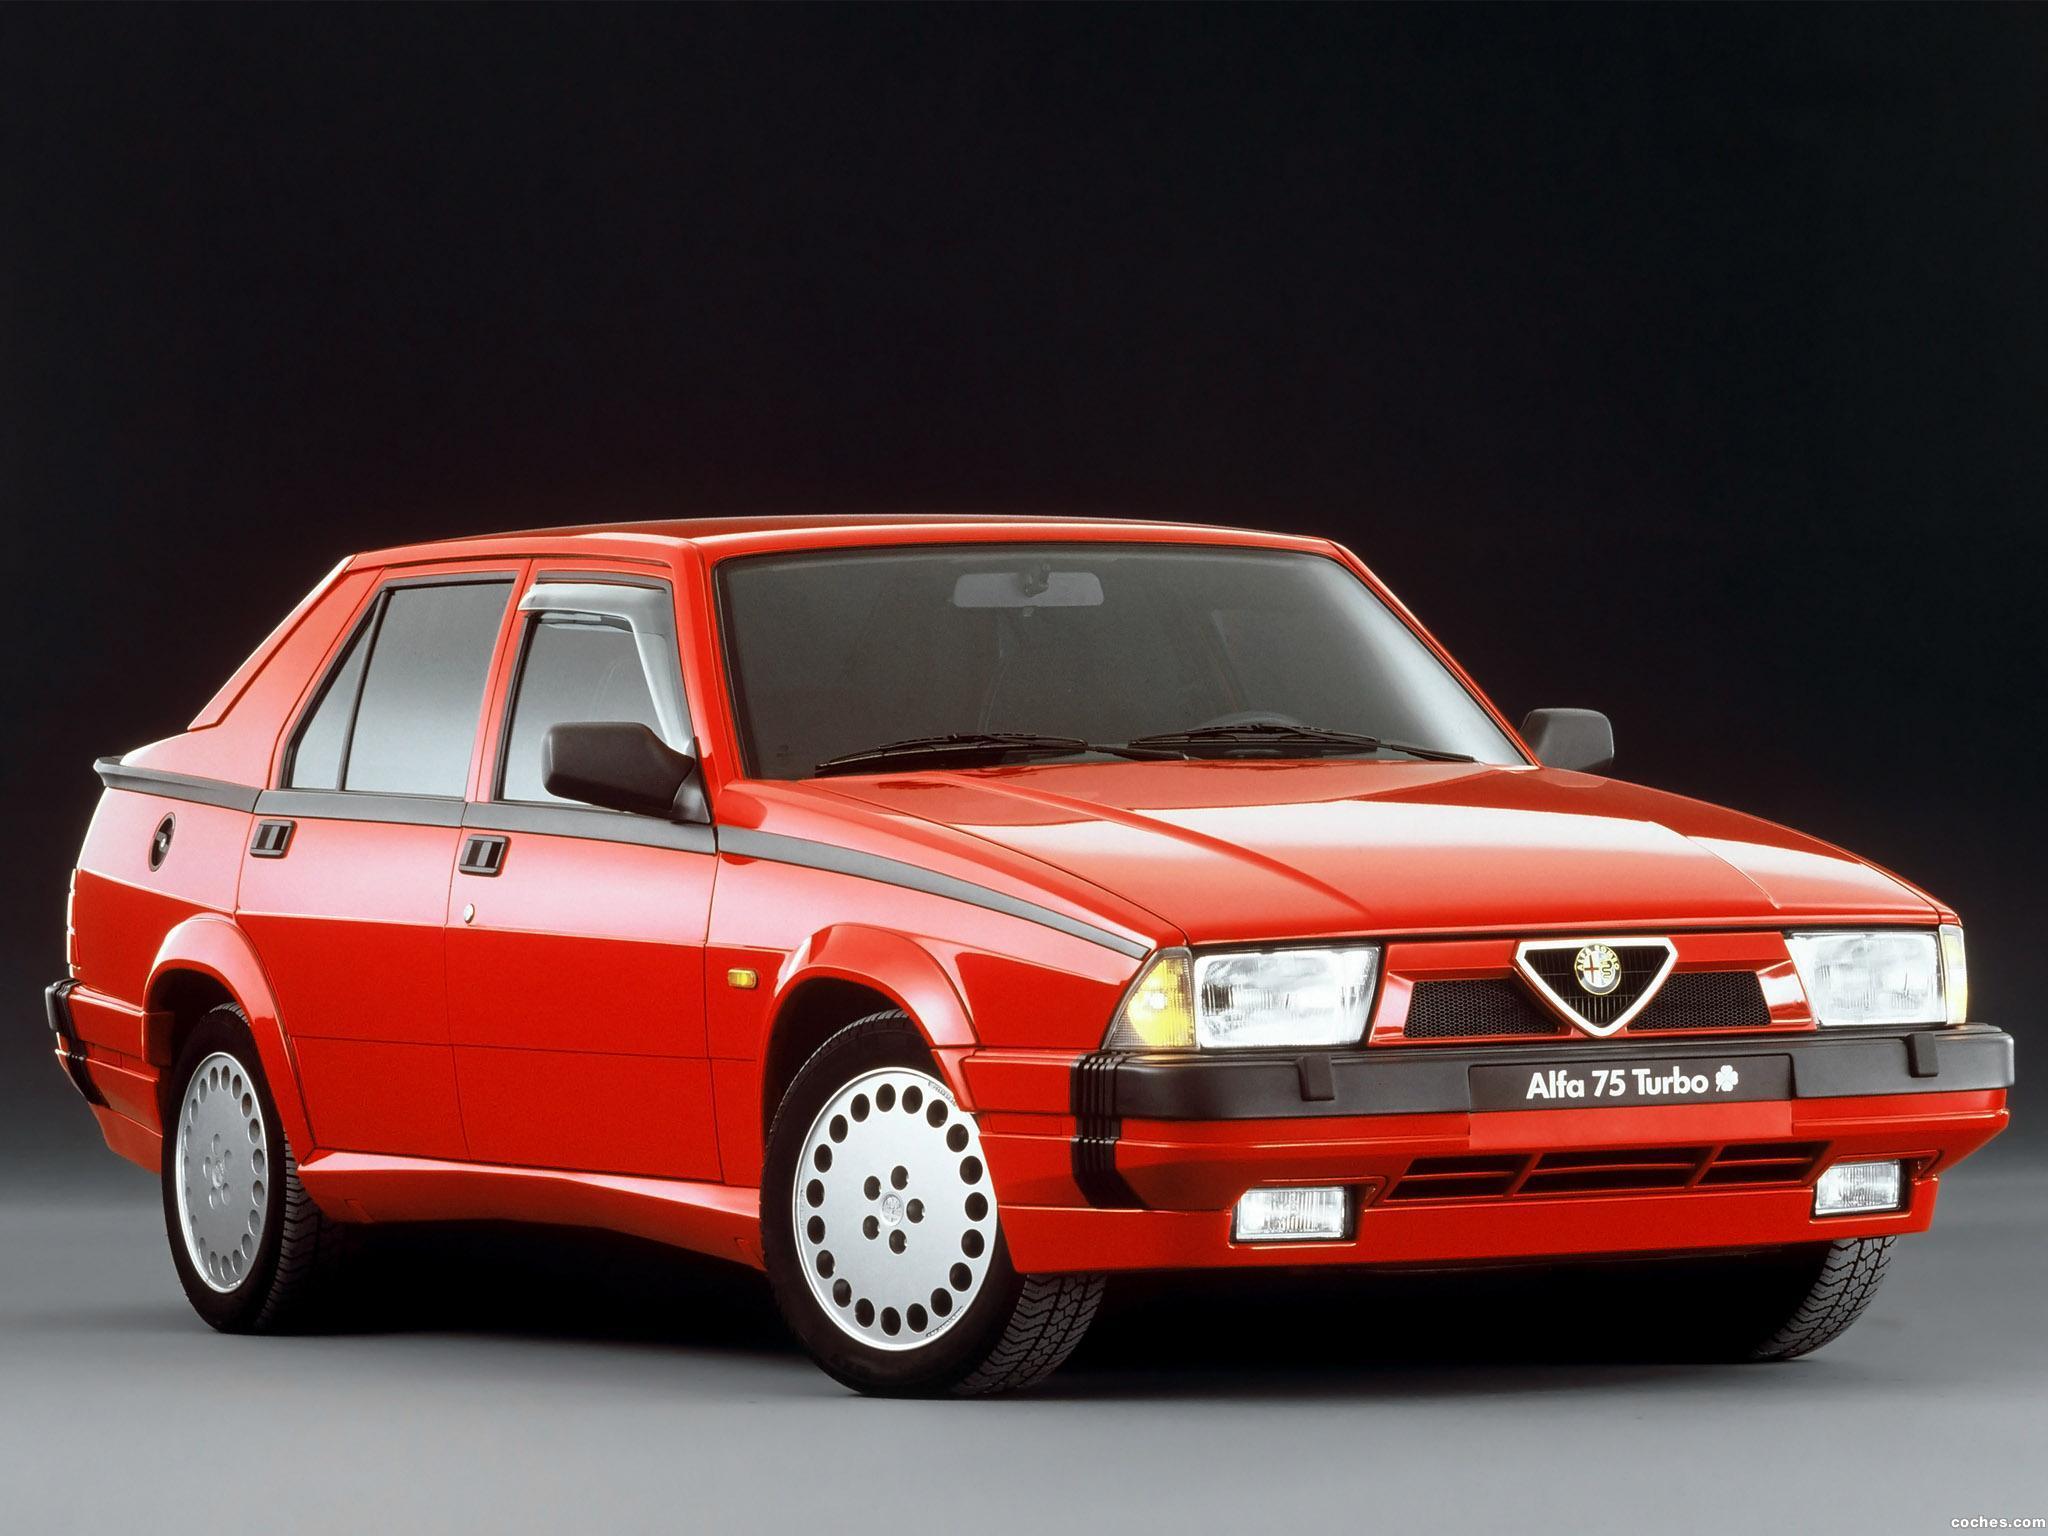 Foto 0 de Alfa Romeo 75 1.8i Turbo Quadrifoglio Verde 162 1988